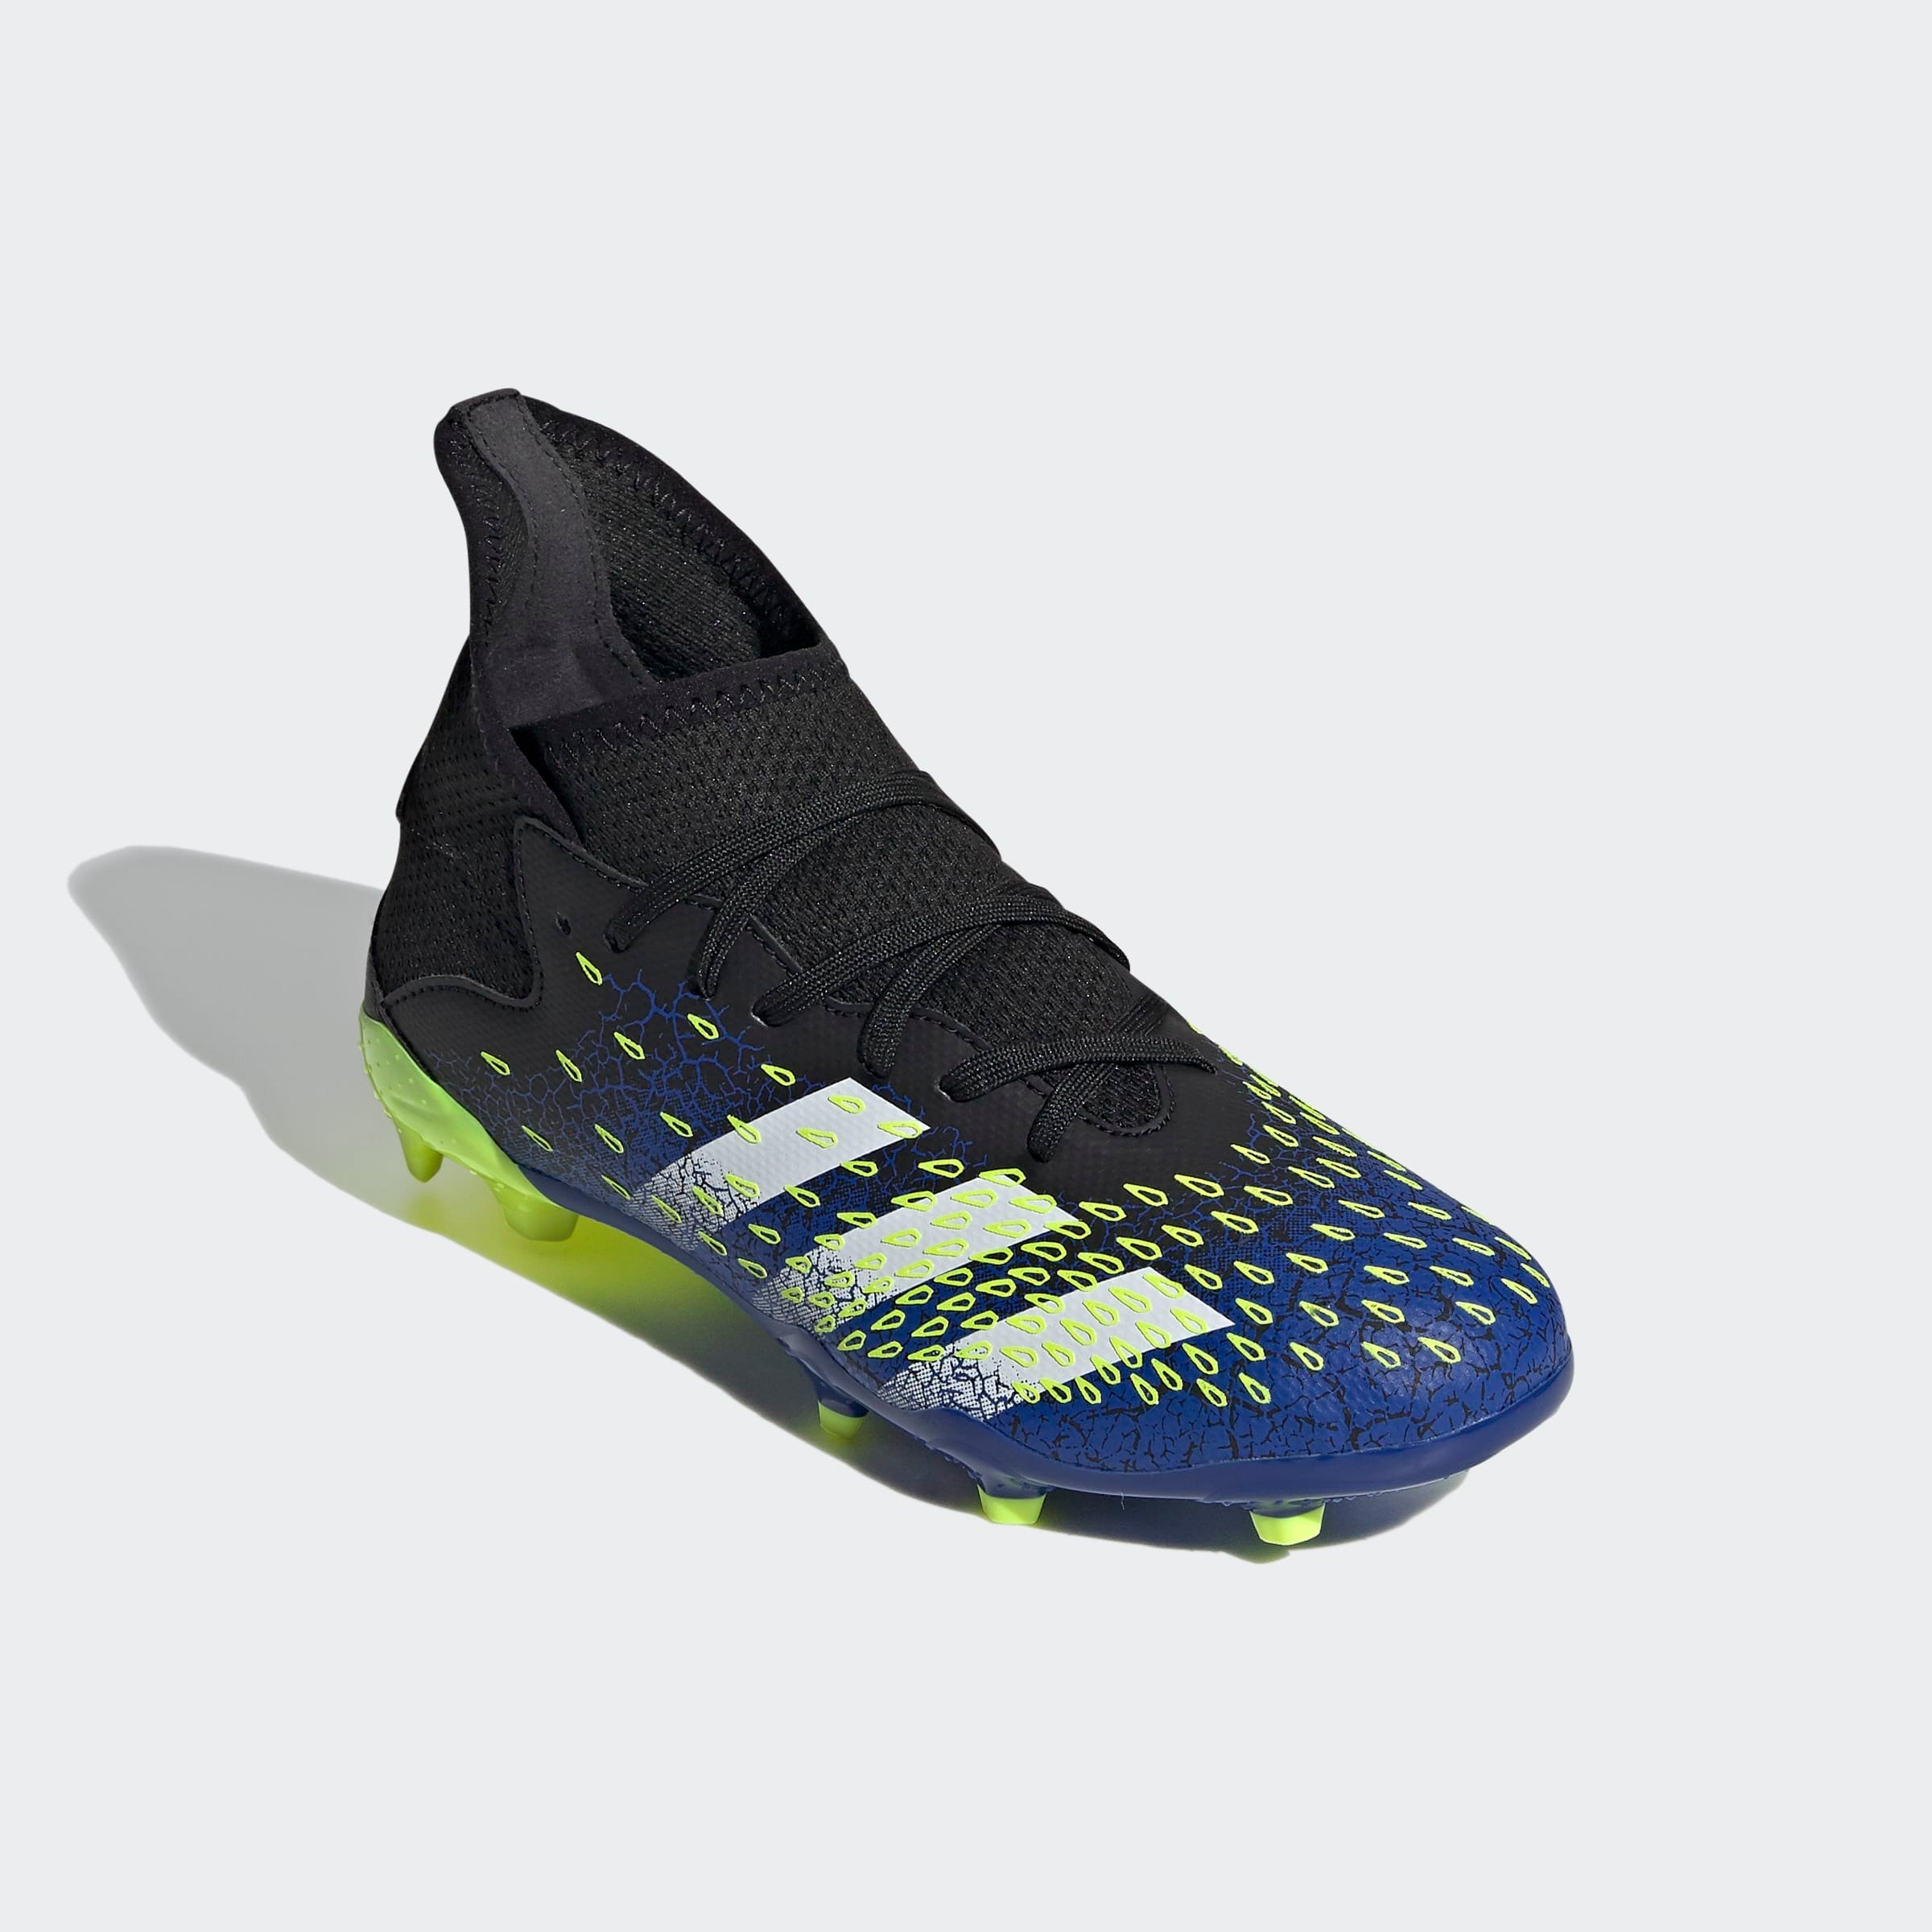 adidas Performance voetbalschoenen PREDATOR FREAK.3 FG veilig op otto.nl kopen